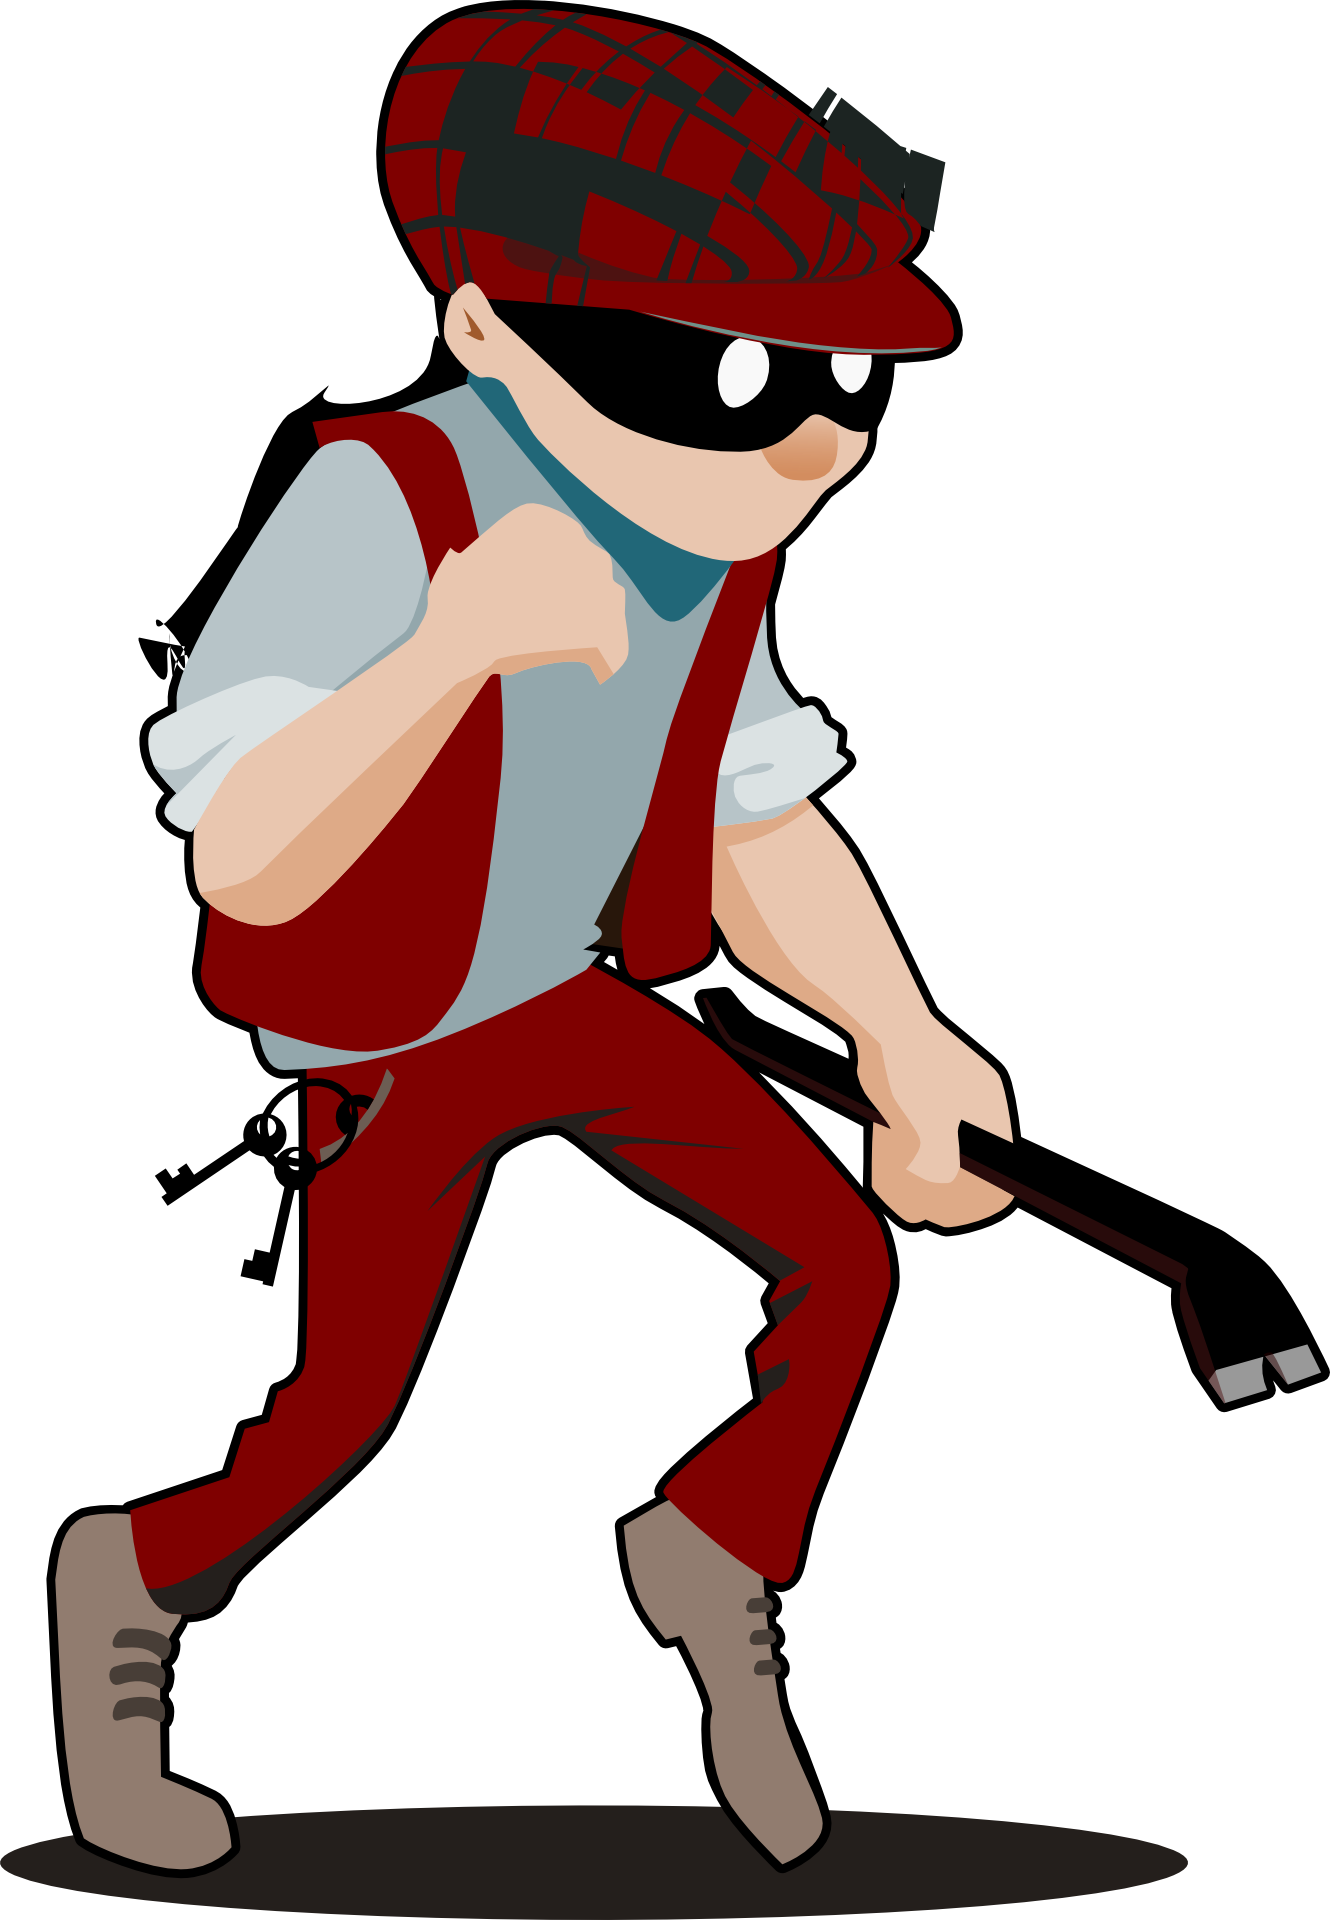 Male free image . Burglar clipart bad guy